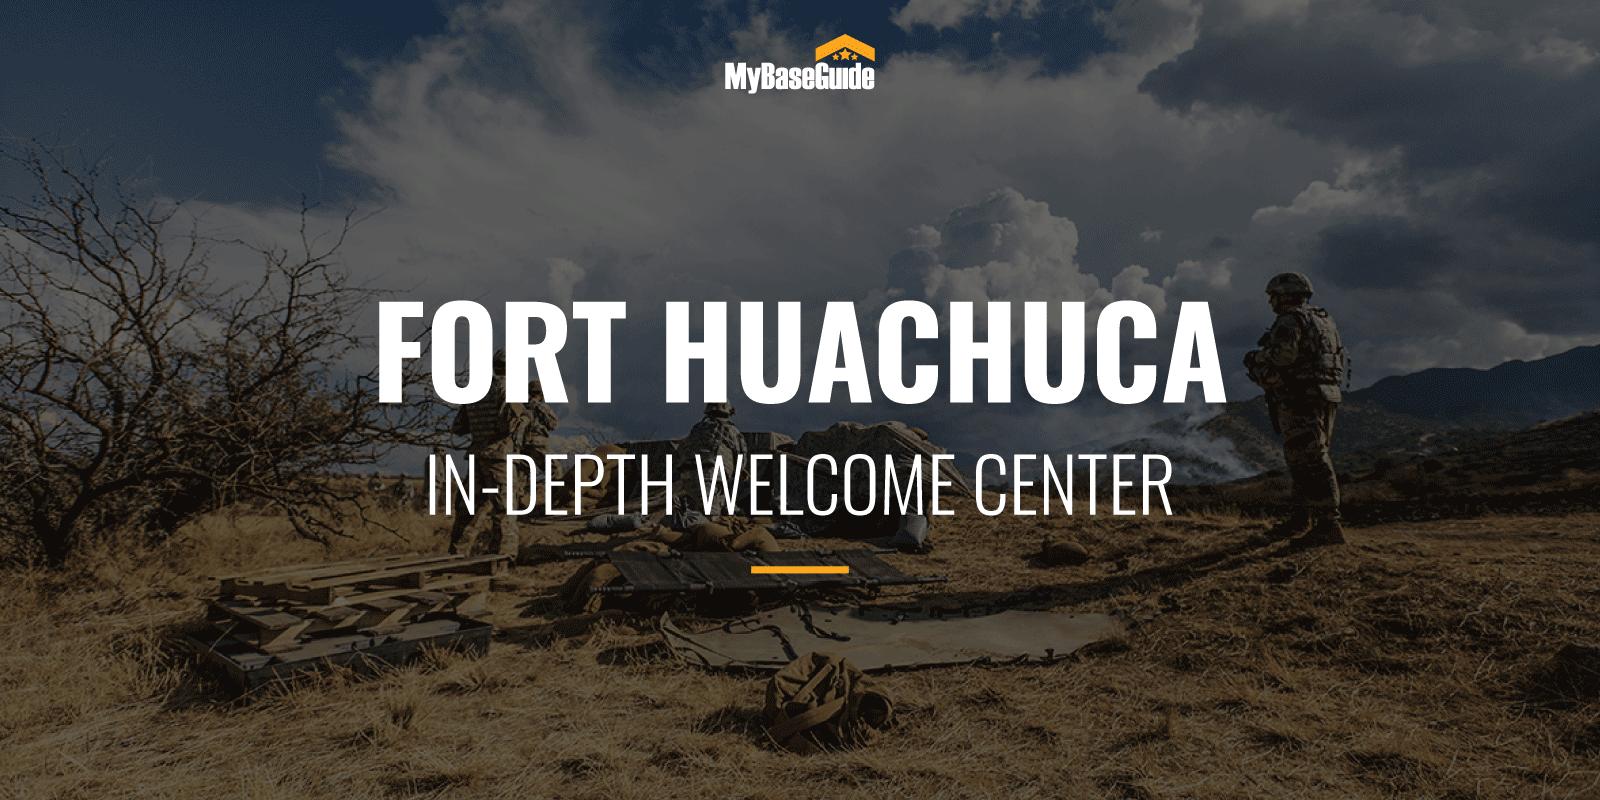 Fort Huachuca: In-Depth Welcome Center